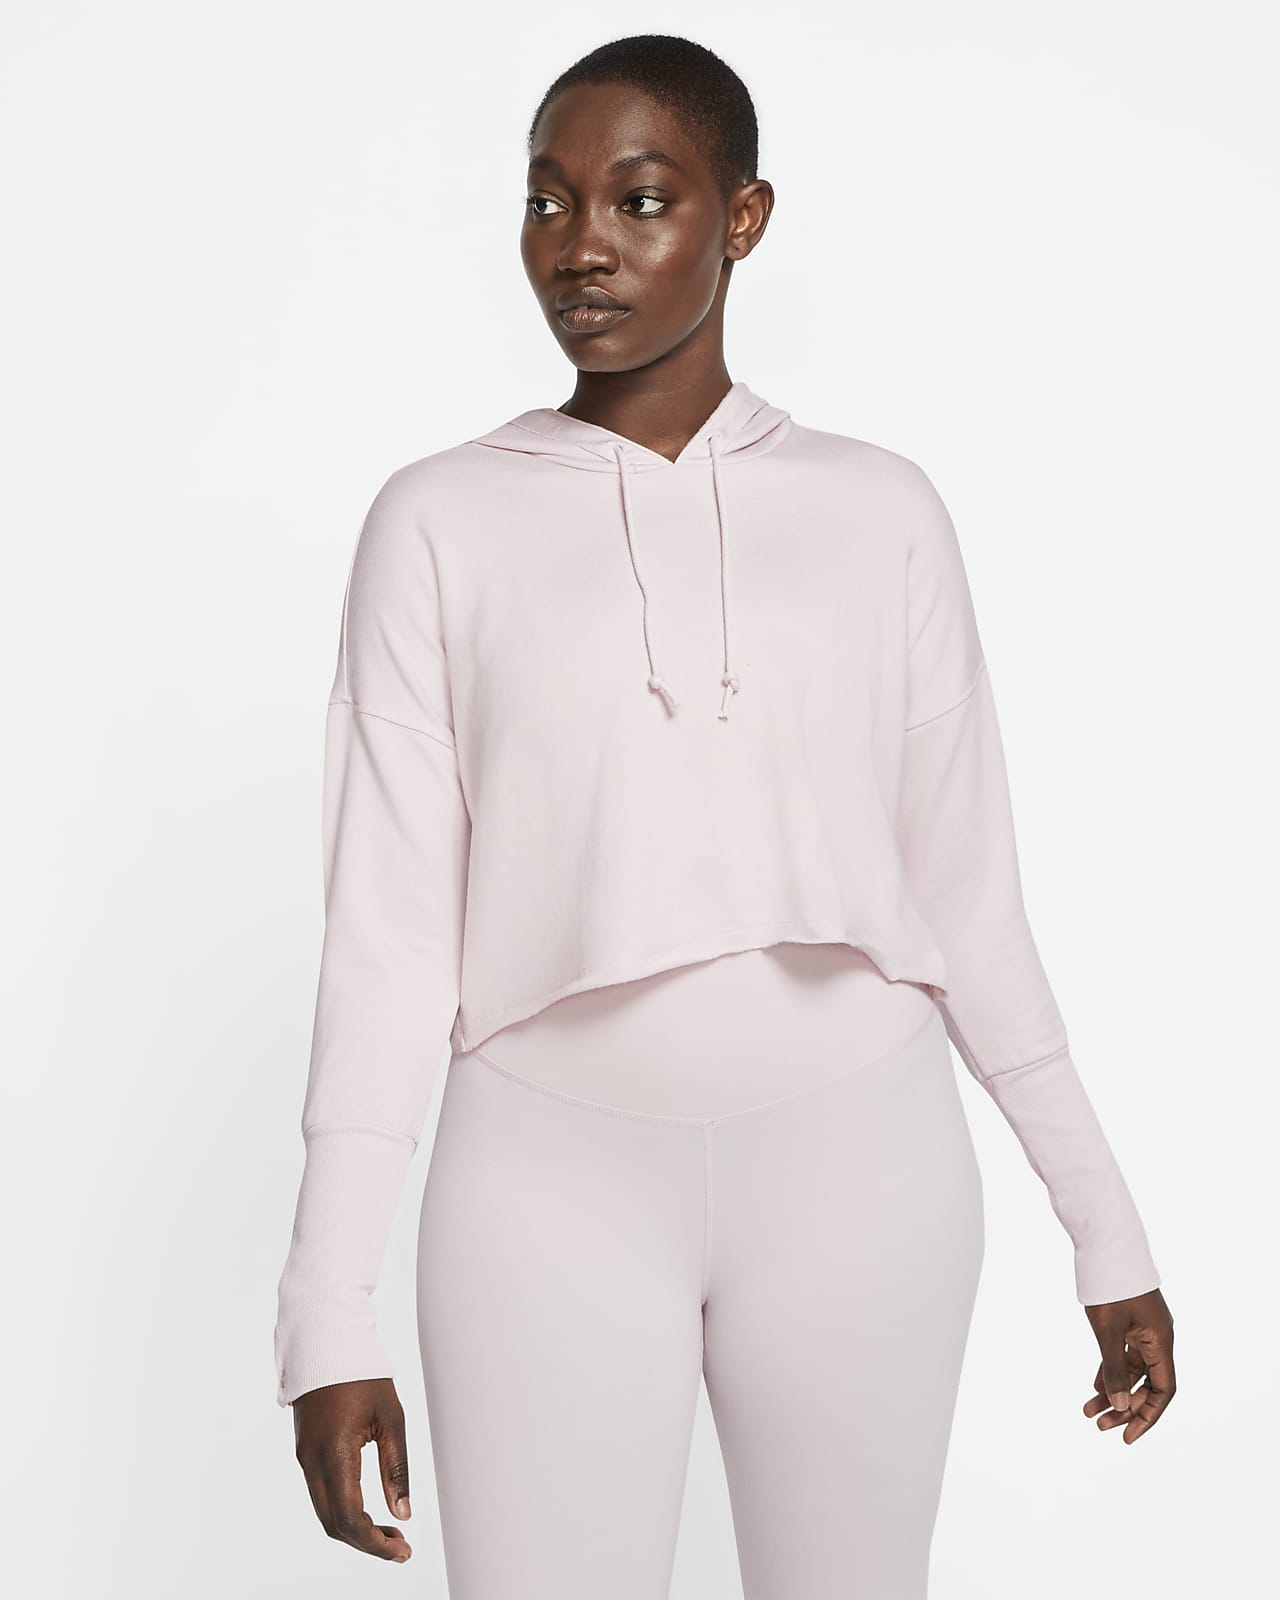 Sudadera corta con capucha para mujer Nike Yoga Luxe